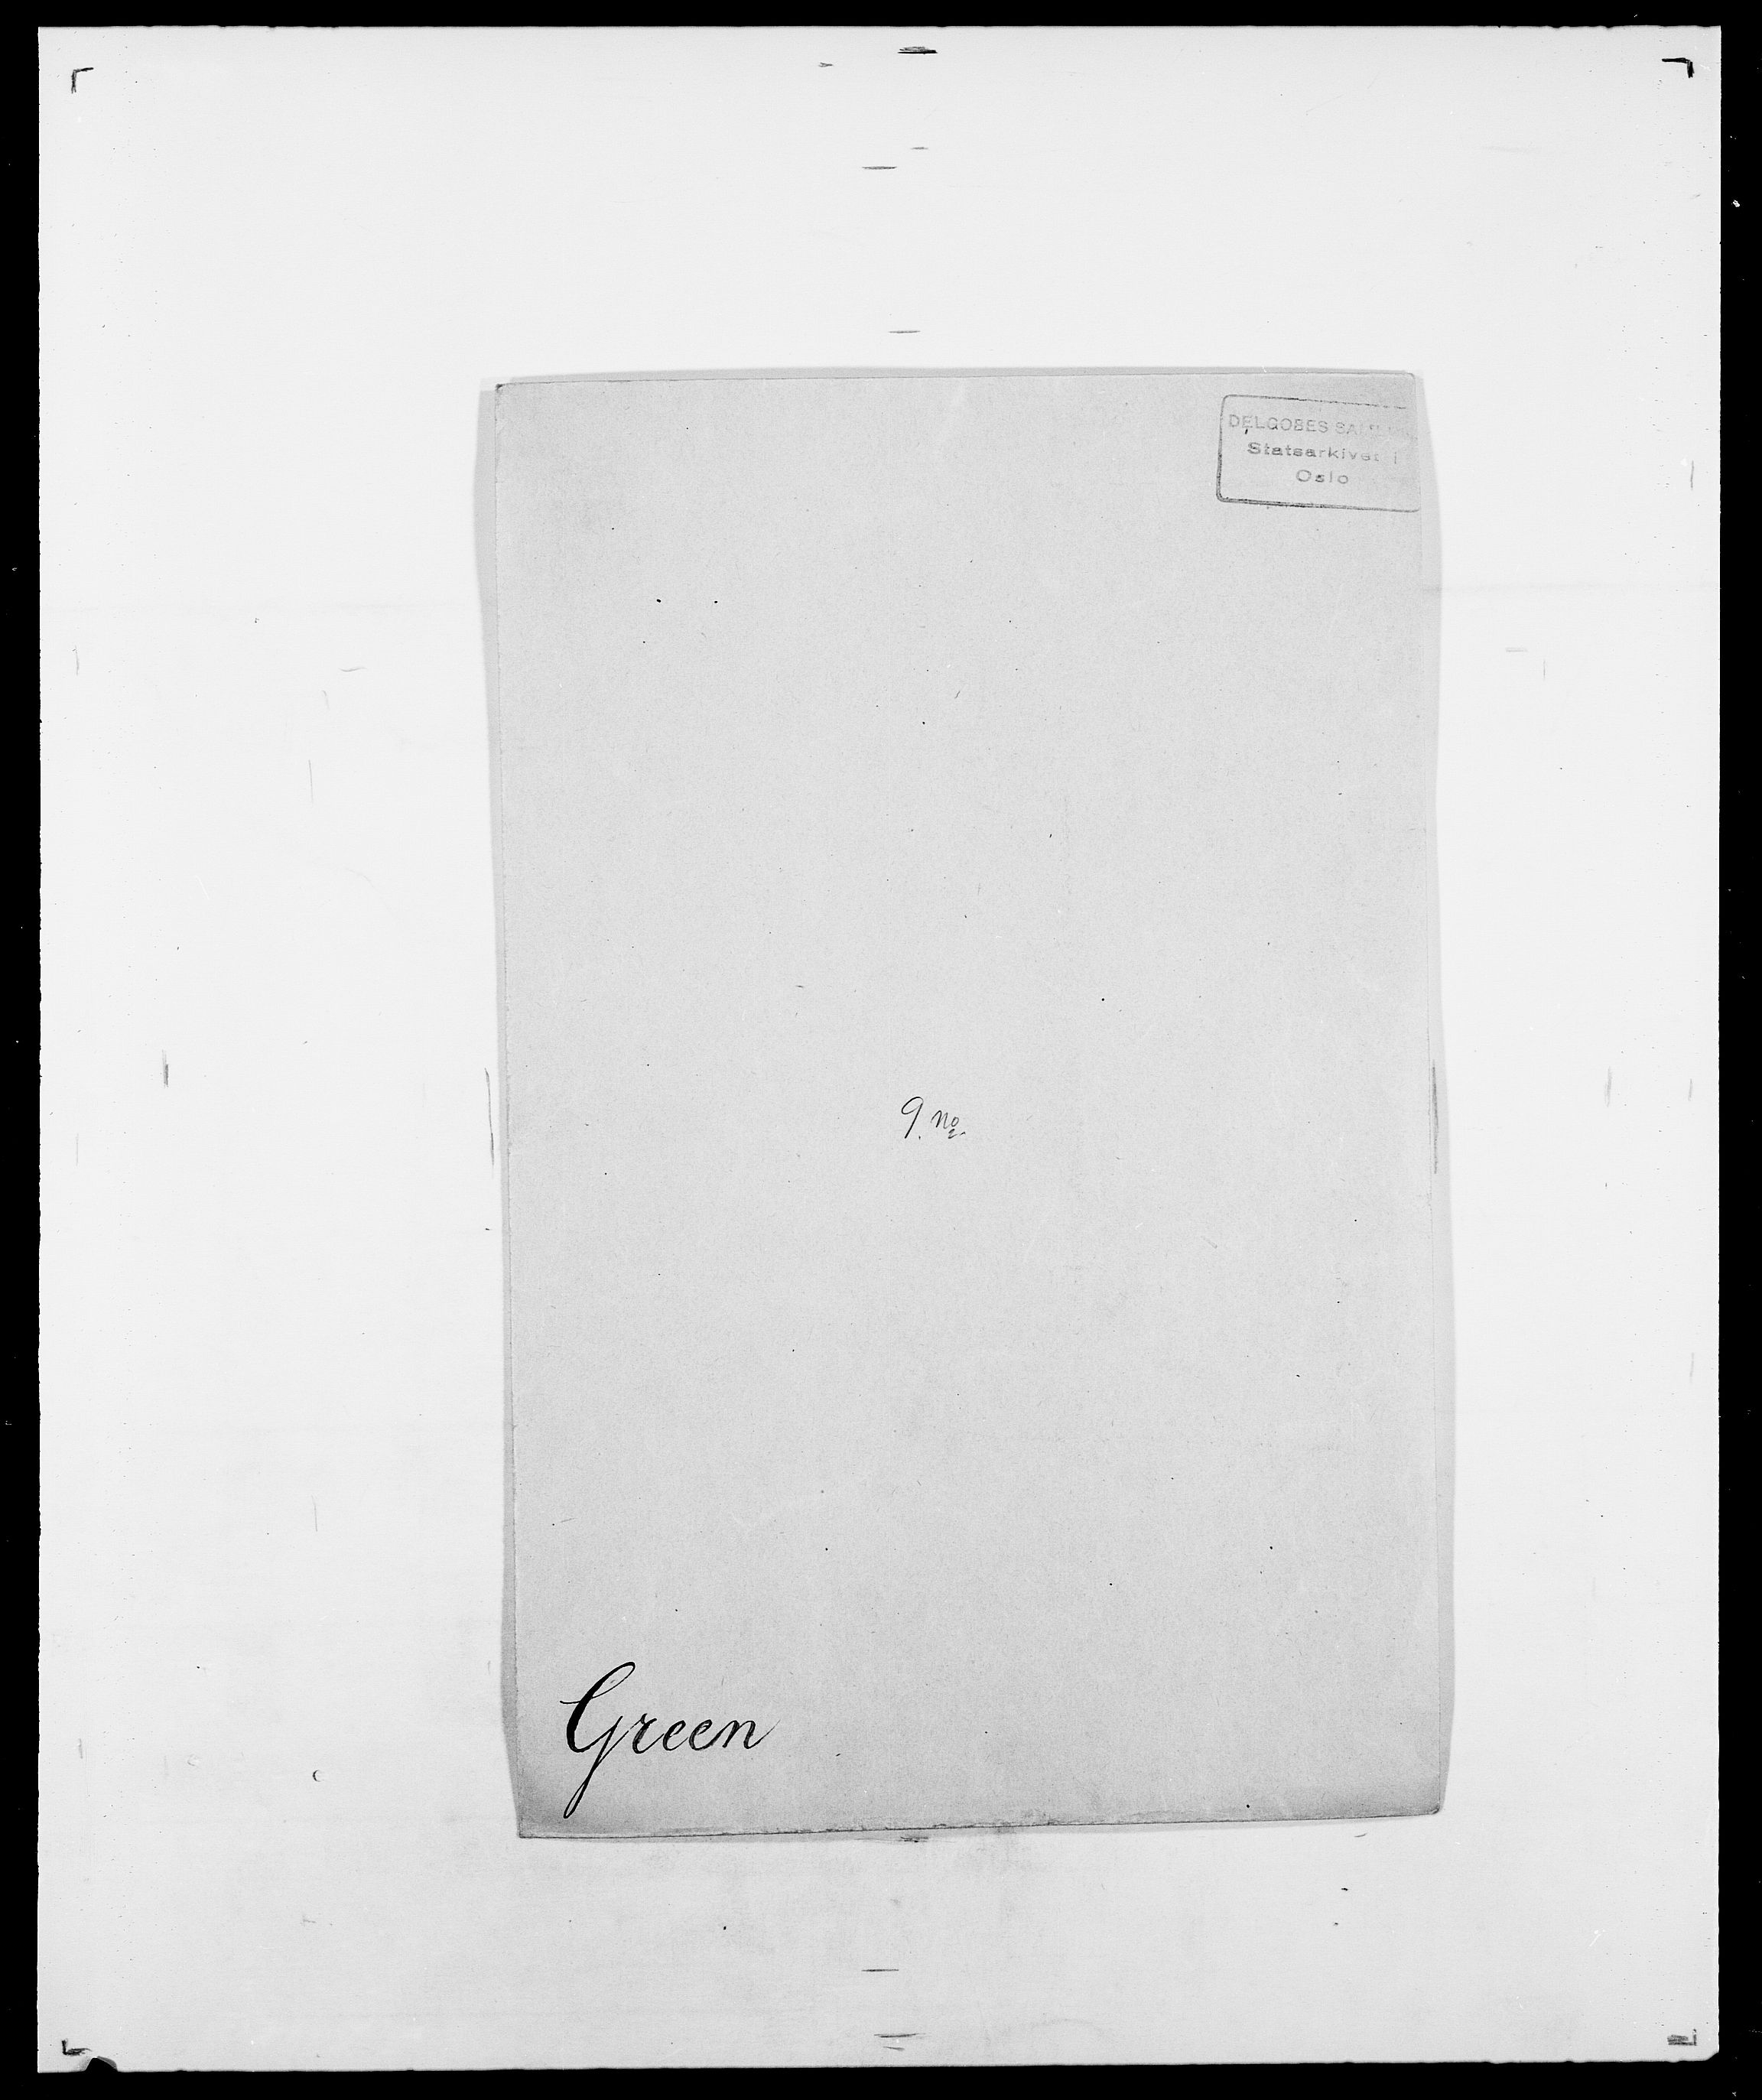 SAO, Delgobe, Charles Antoine - samling, D/Da/L0014: Giebdhausen - Grip, s. 569